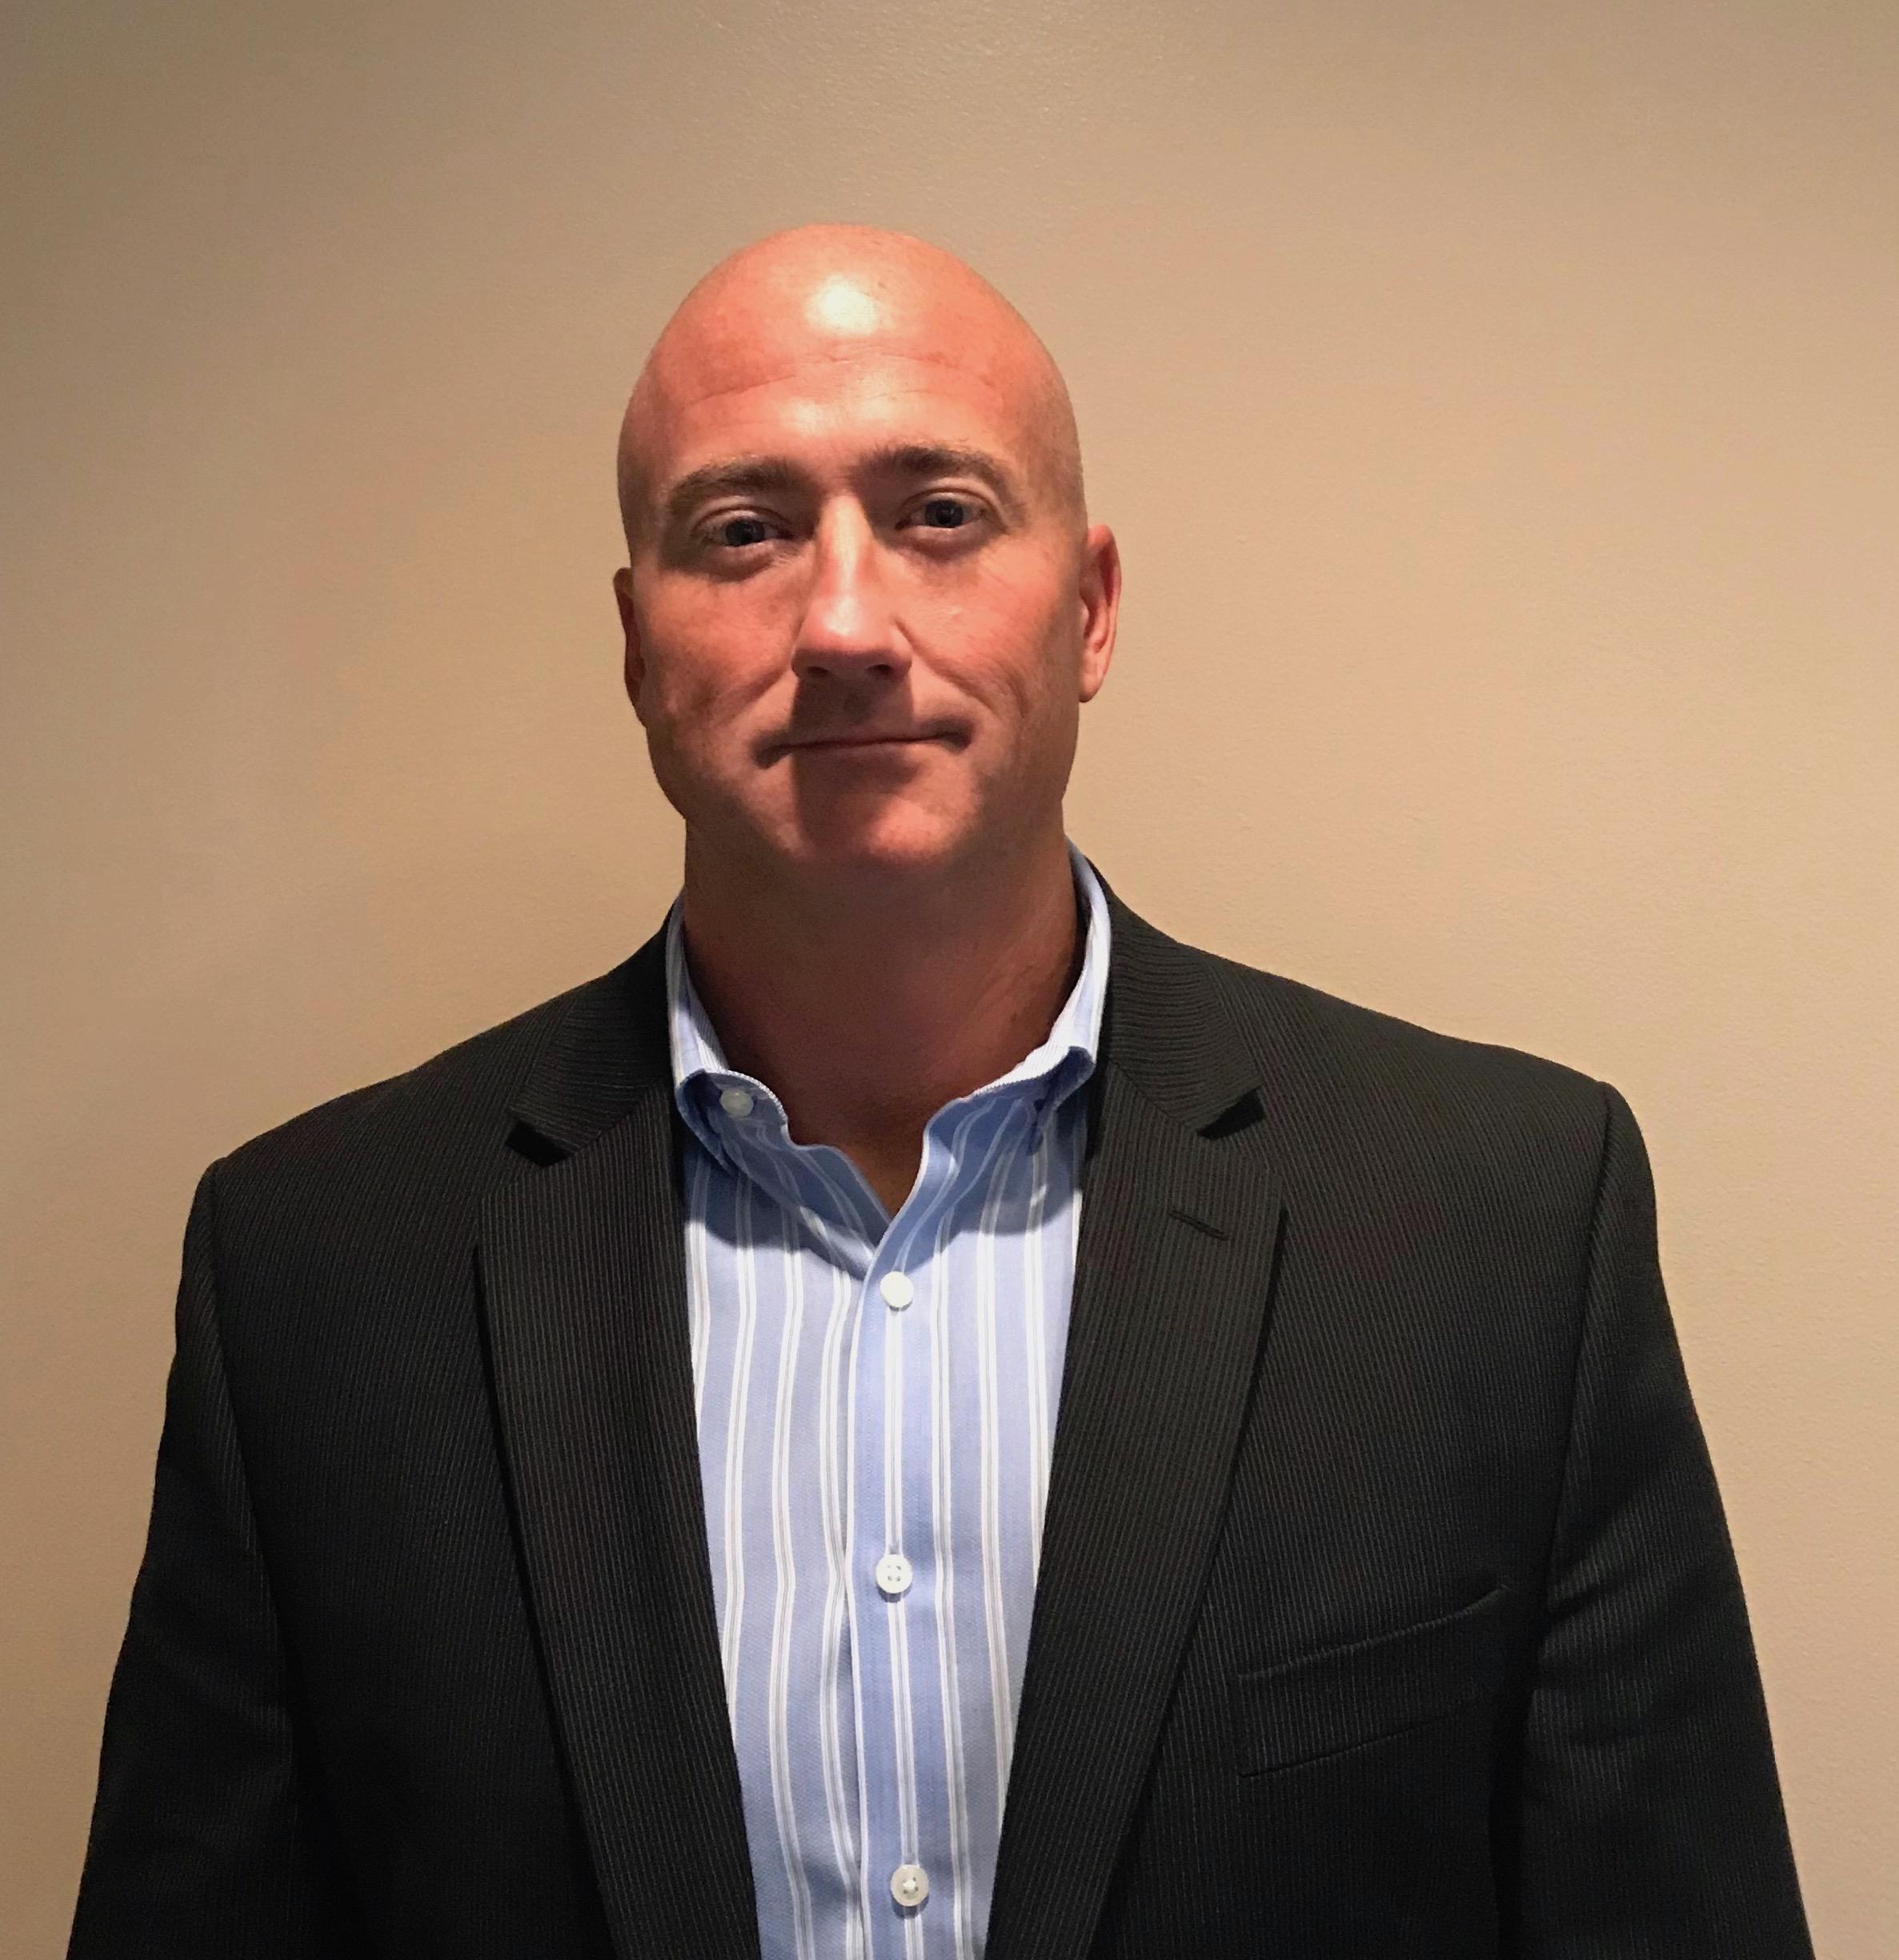 Commerce MI Social Worker, Therapist Robert Brill, LMSW